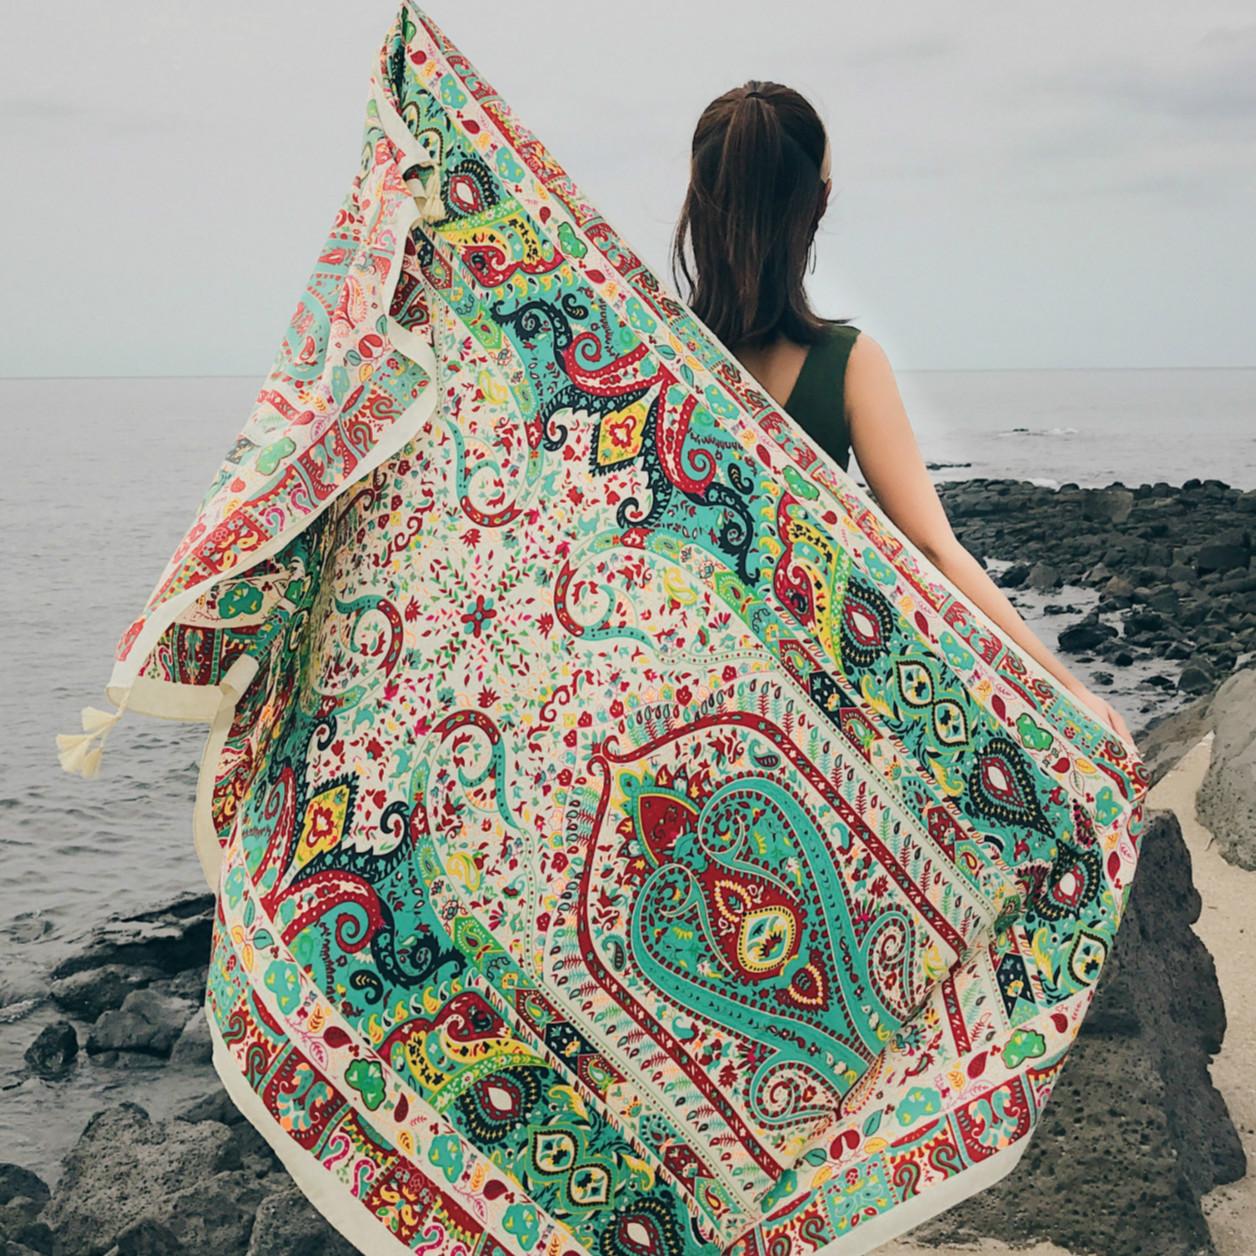 wf春夏季女海边防晒沙滩巾围巾两用披肩优惠券